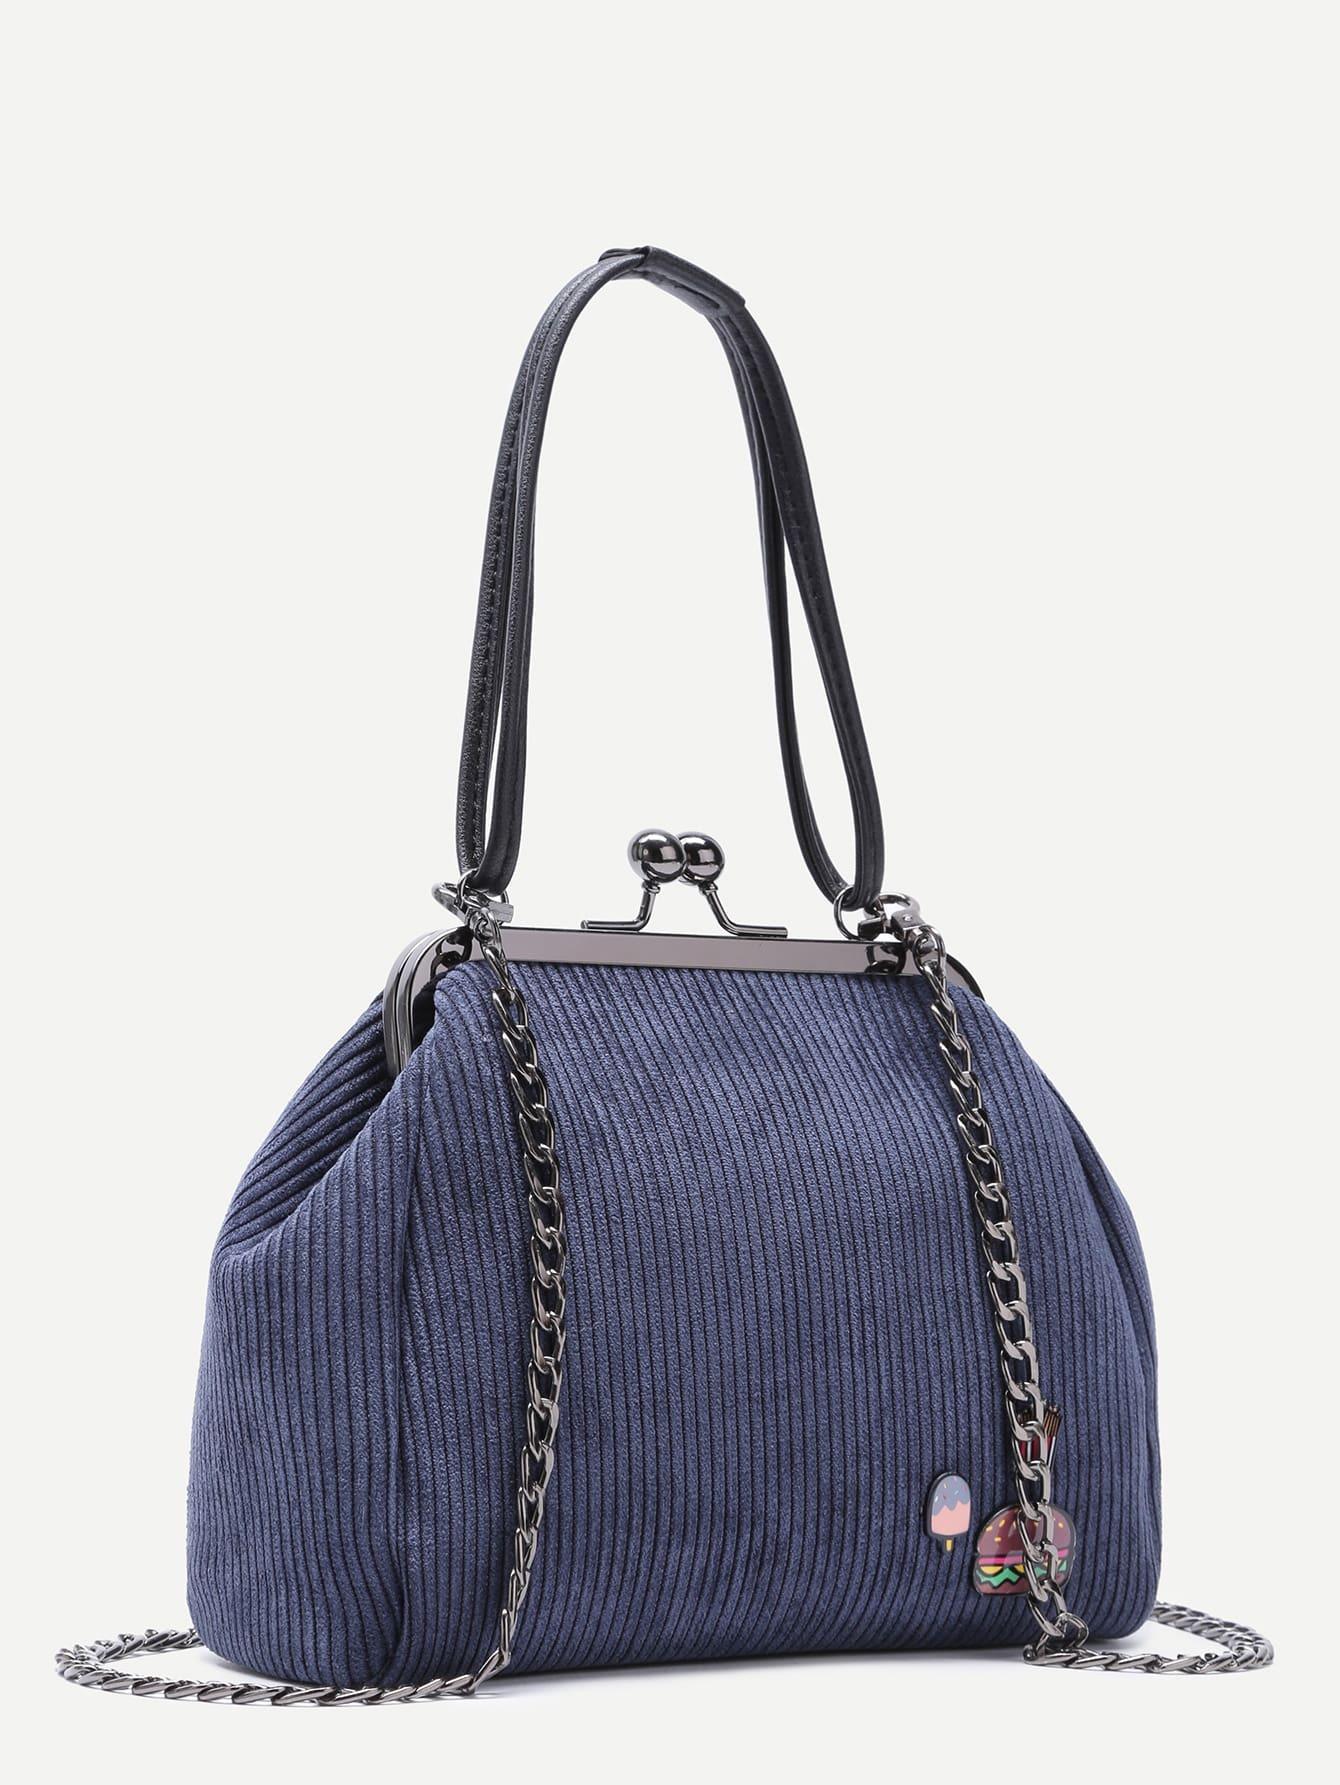 bag161121906_2